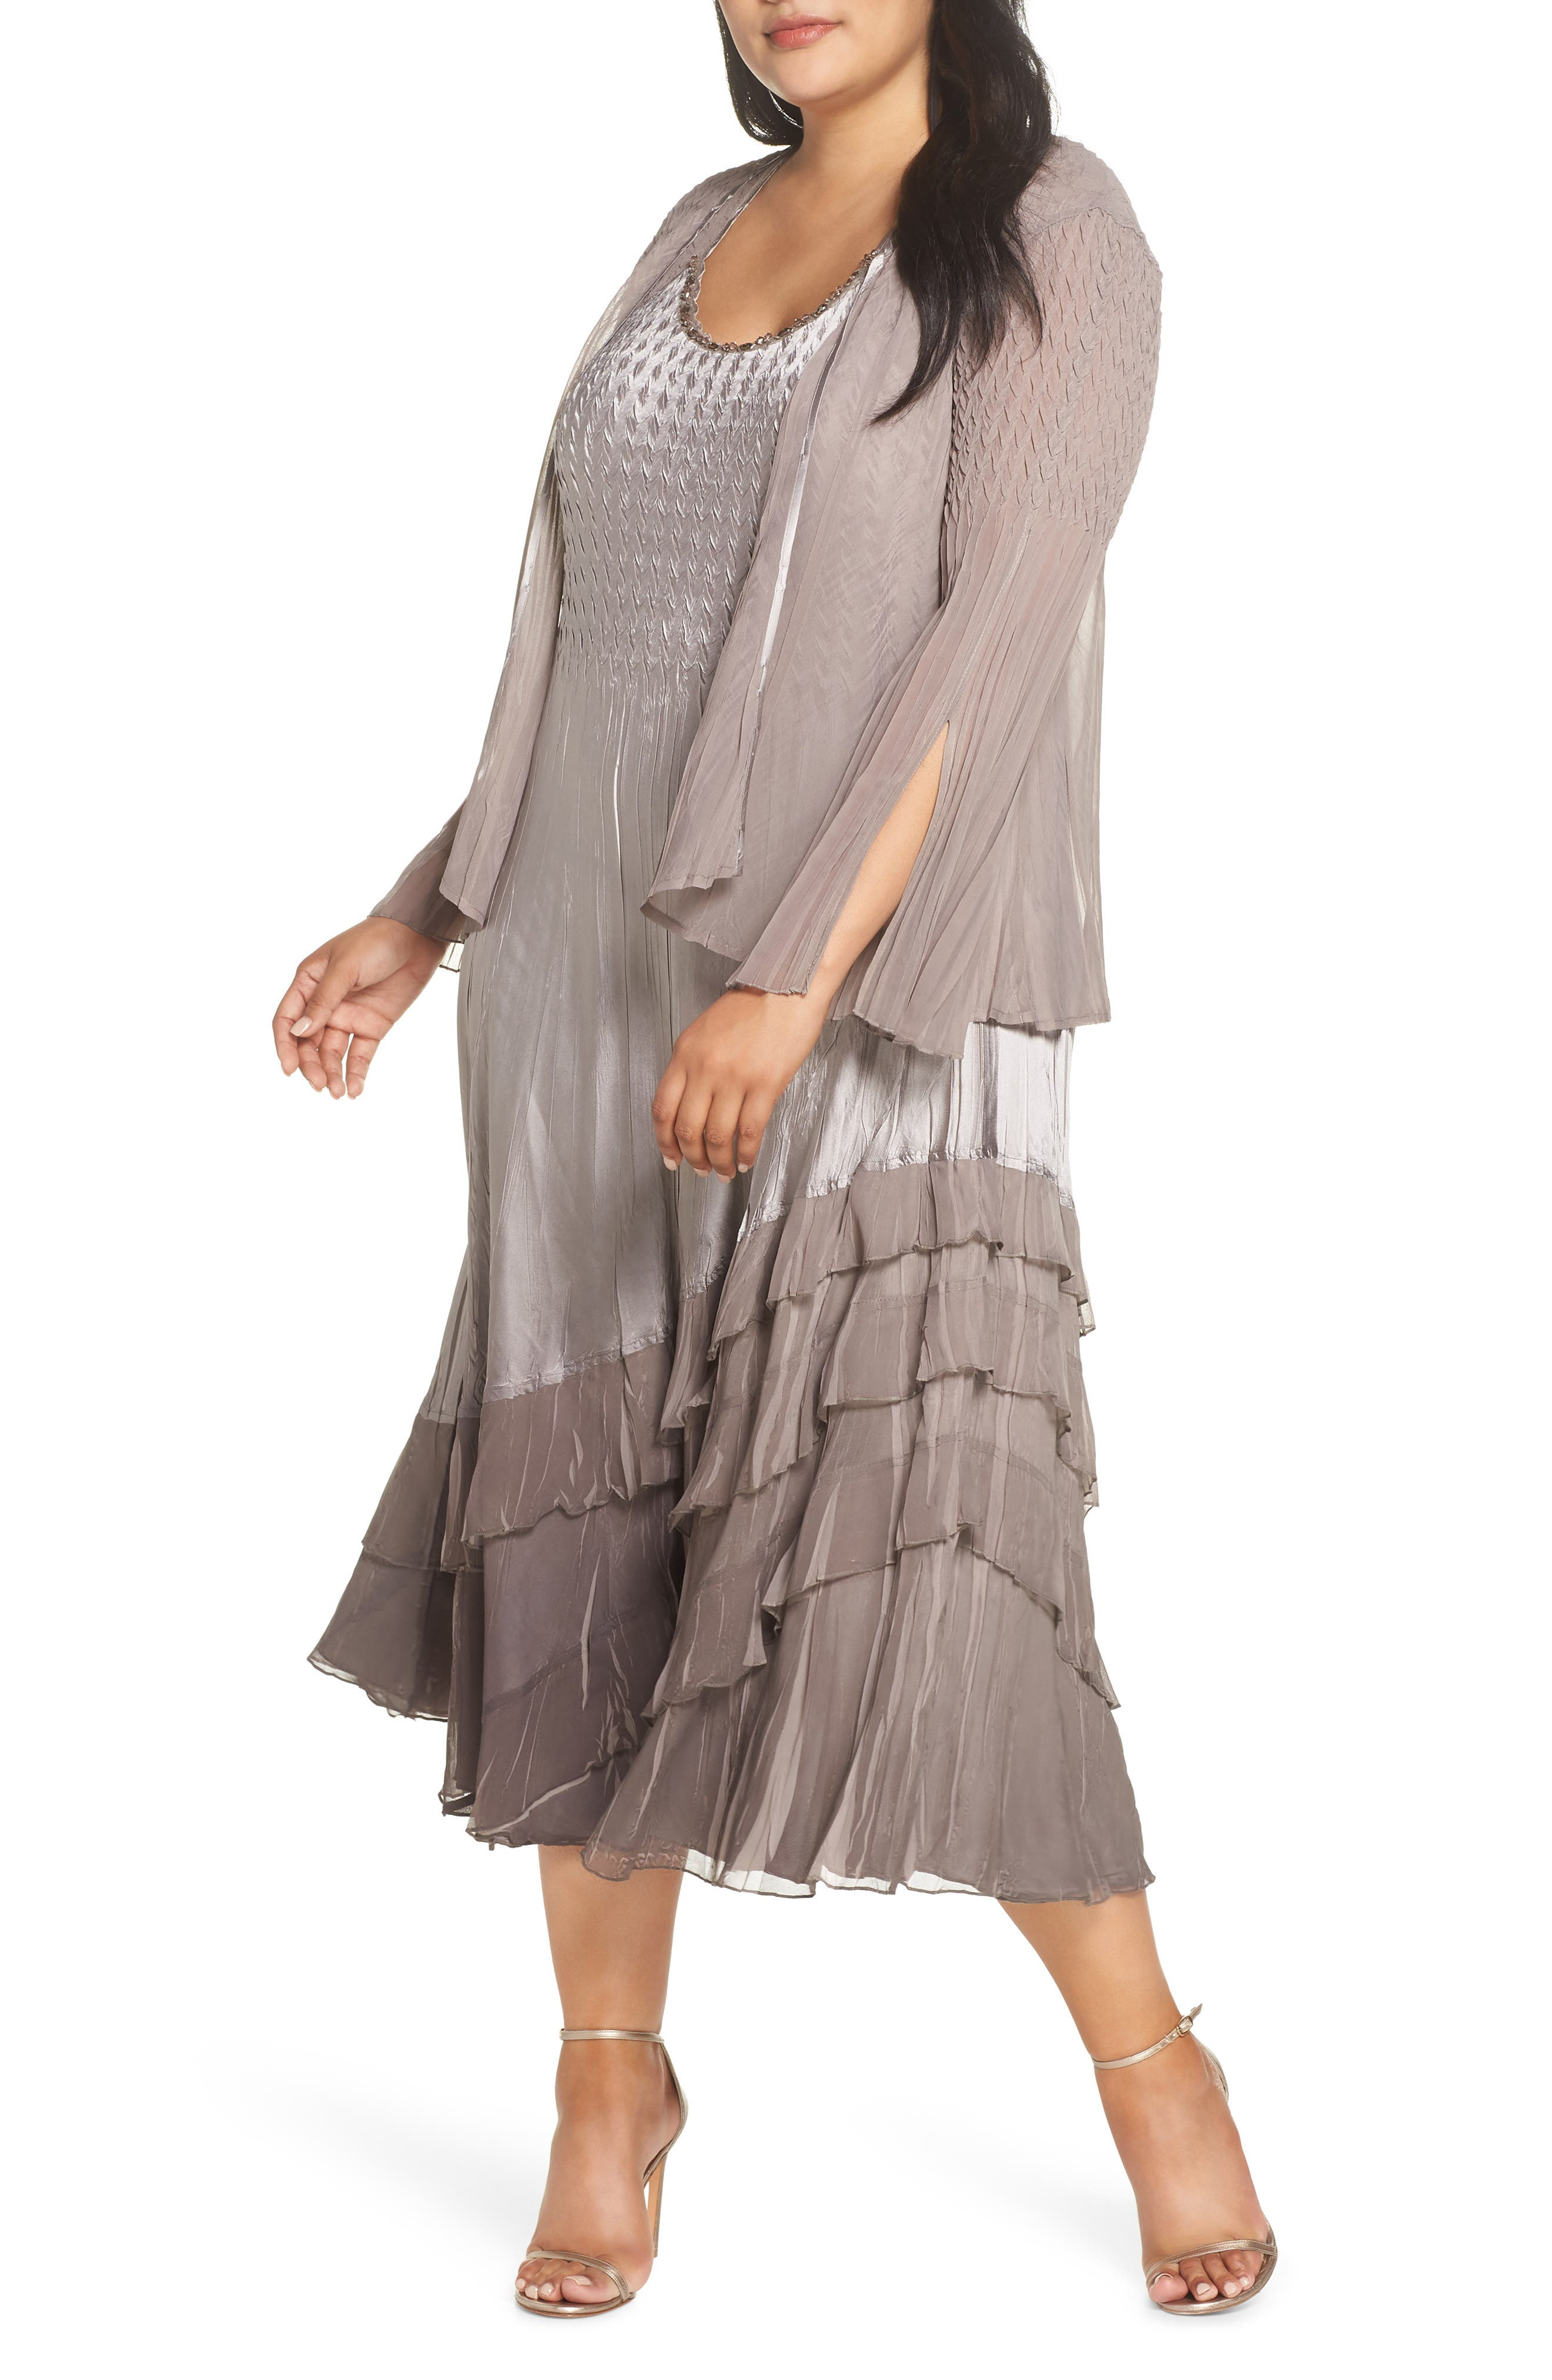 3b487a6c9d8c9c Plus Size Women's Komarov A-Line Dress With Jacket, Size 1X - Beige